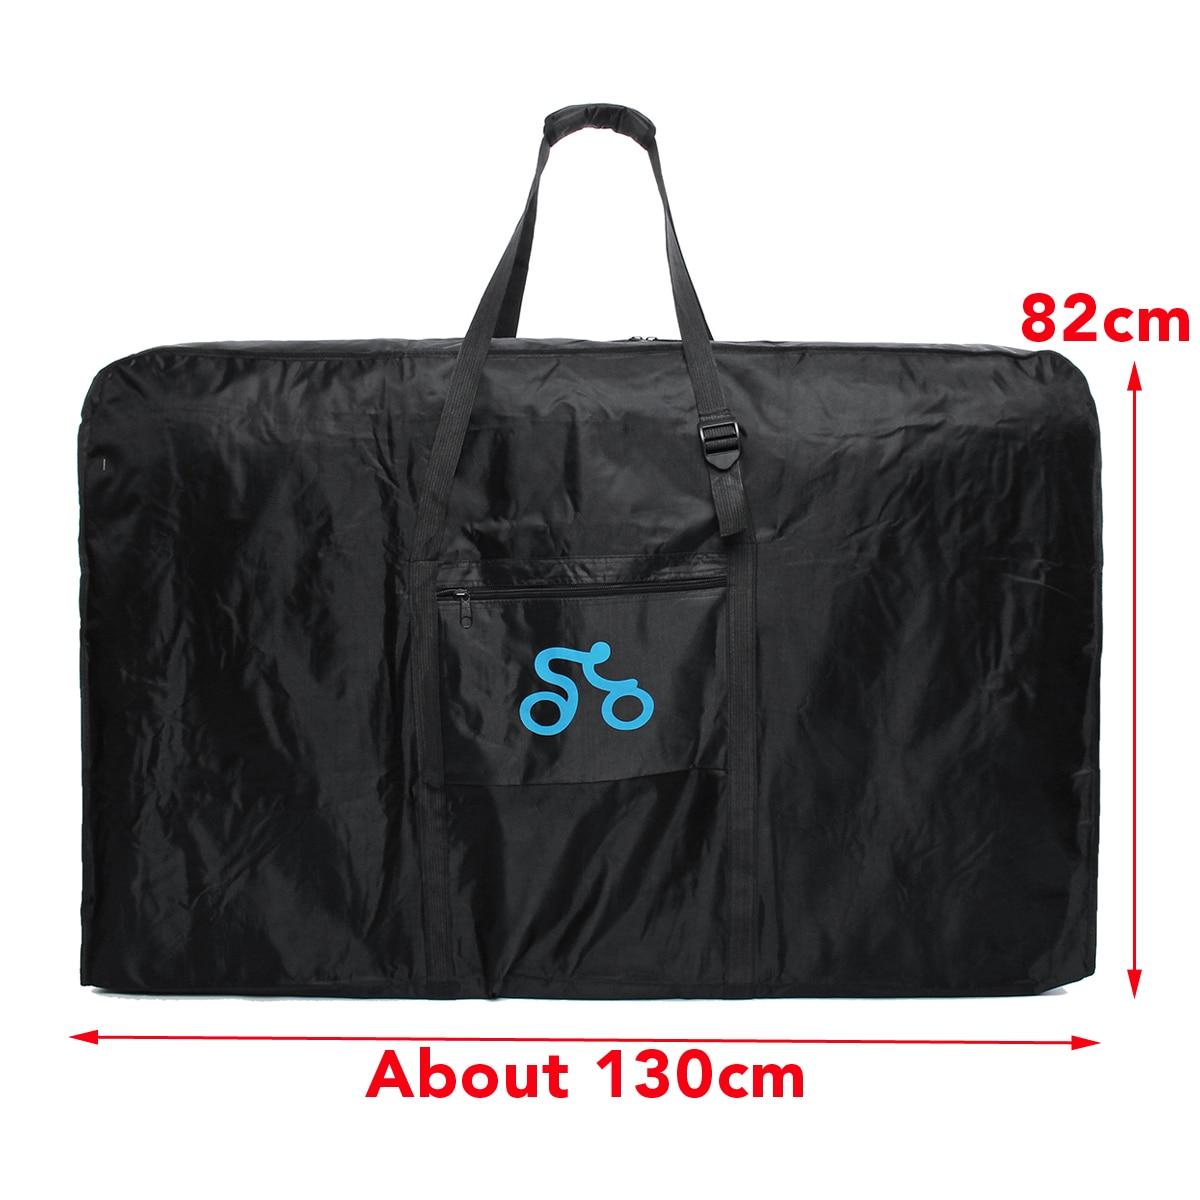 1680D 26-29 pulgadas de Nylon portátil de la bicicleta bolsa de bicicleta de ciclismo transporte viaje caso bicicleta accesorios - 2